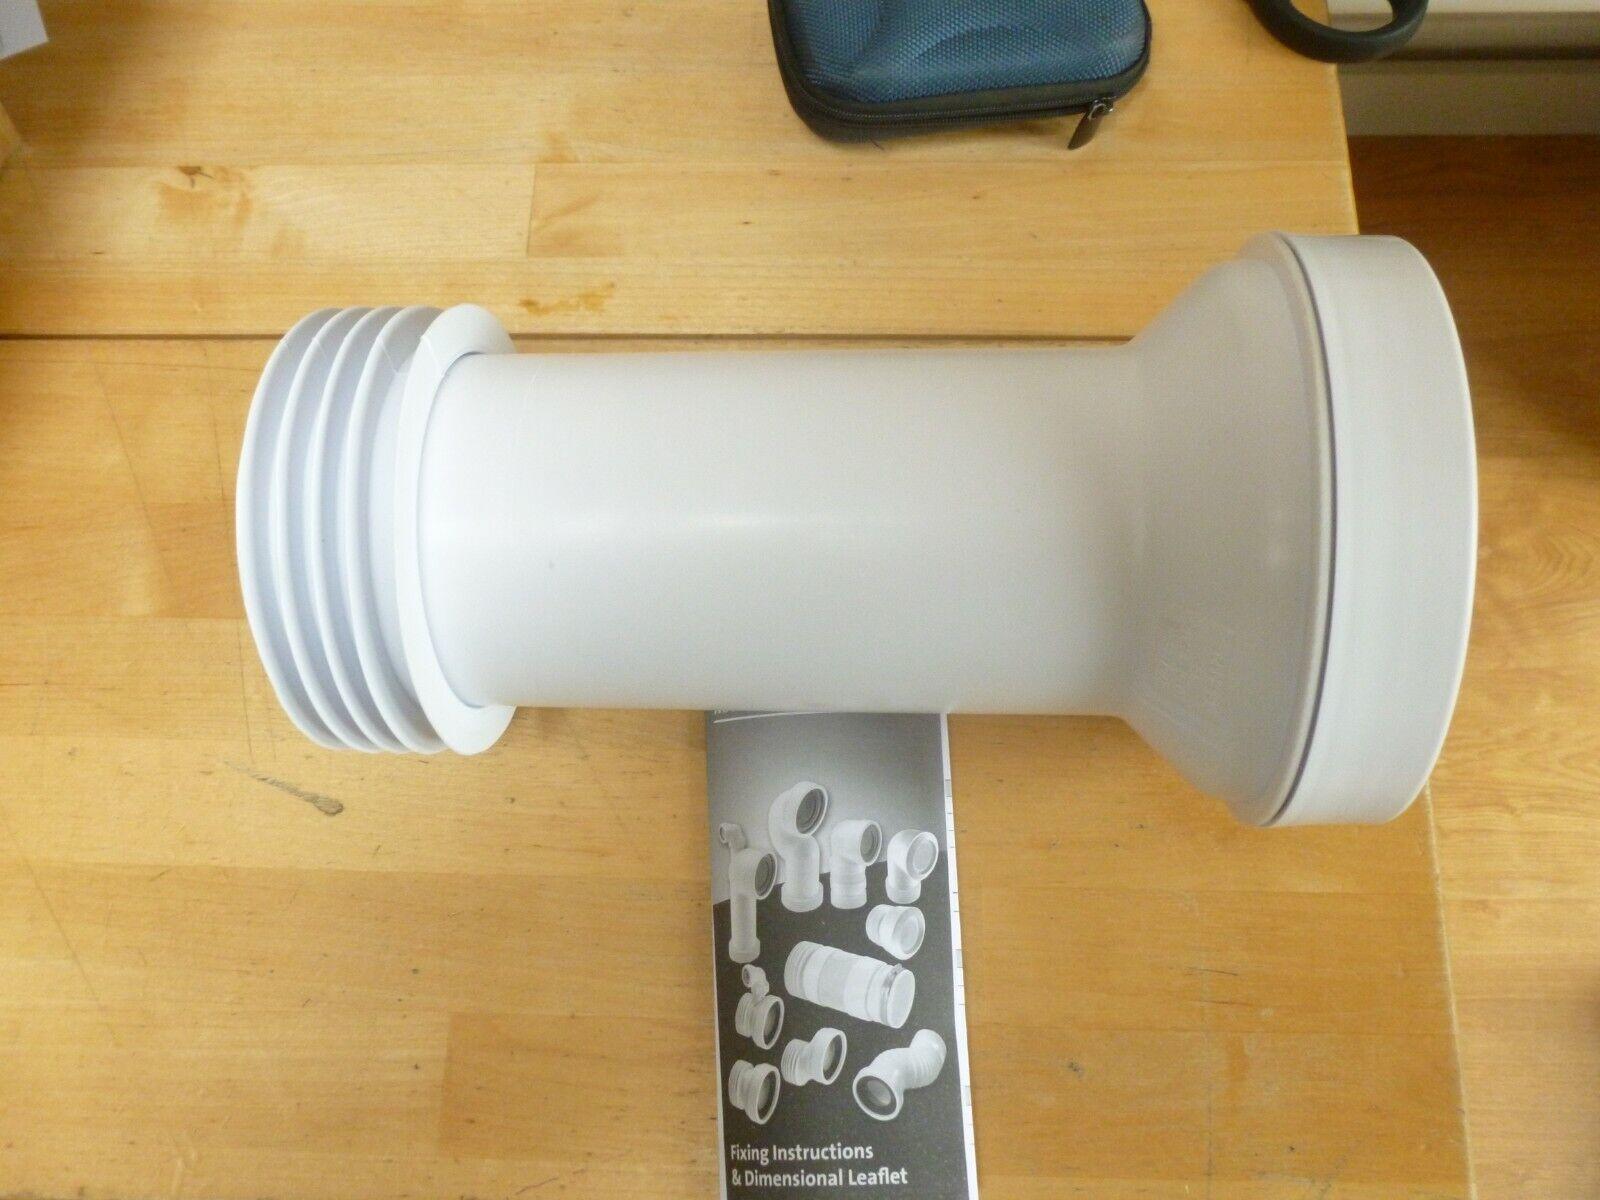 Adjustable Length McAlpine WC-CON2 Pan Connector